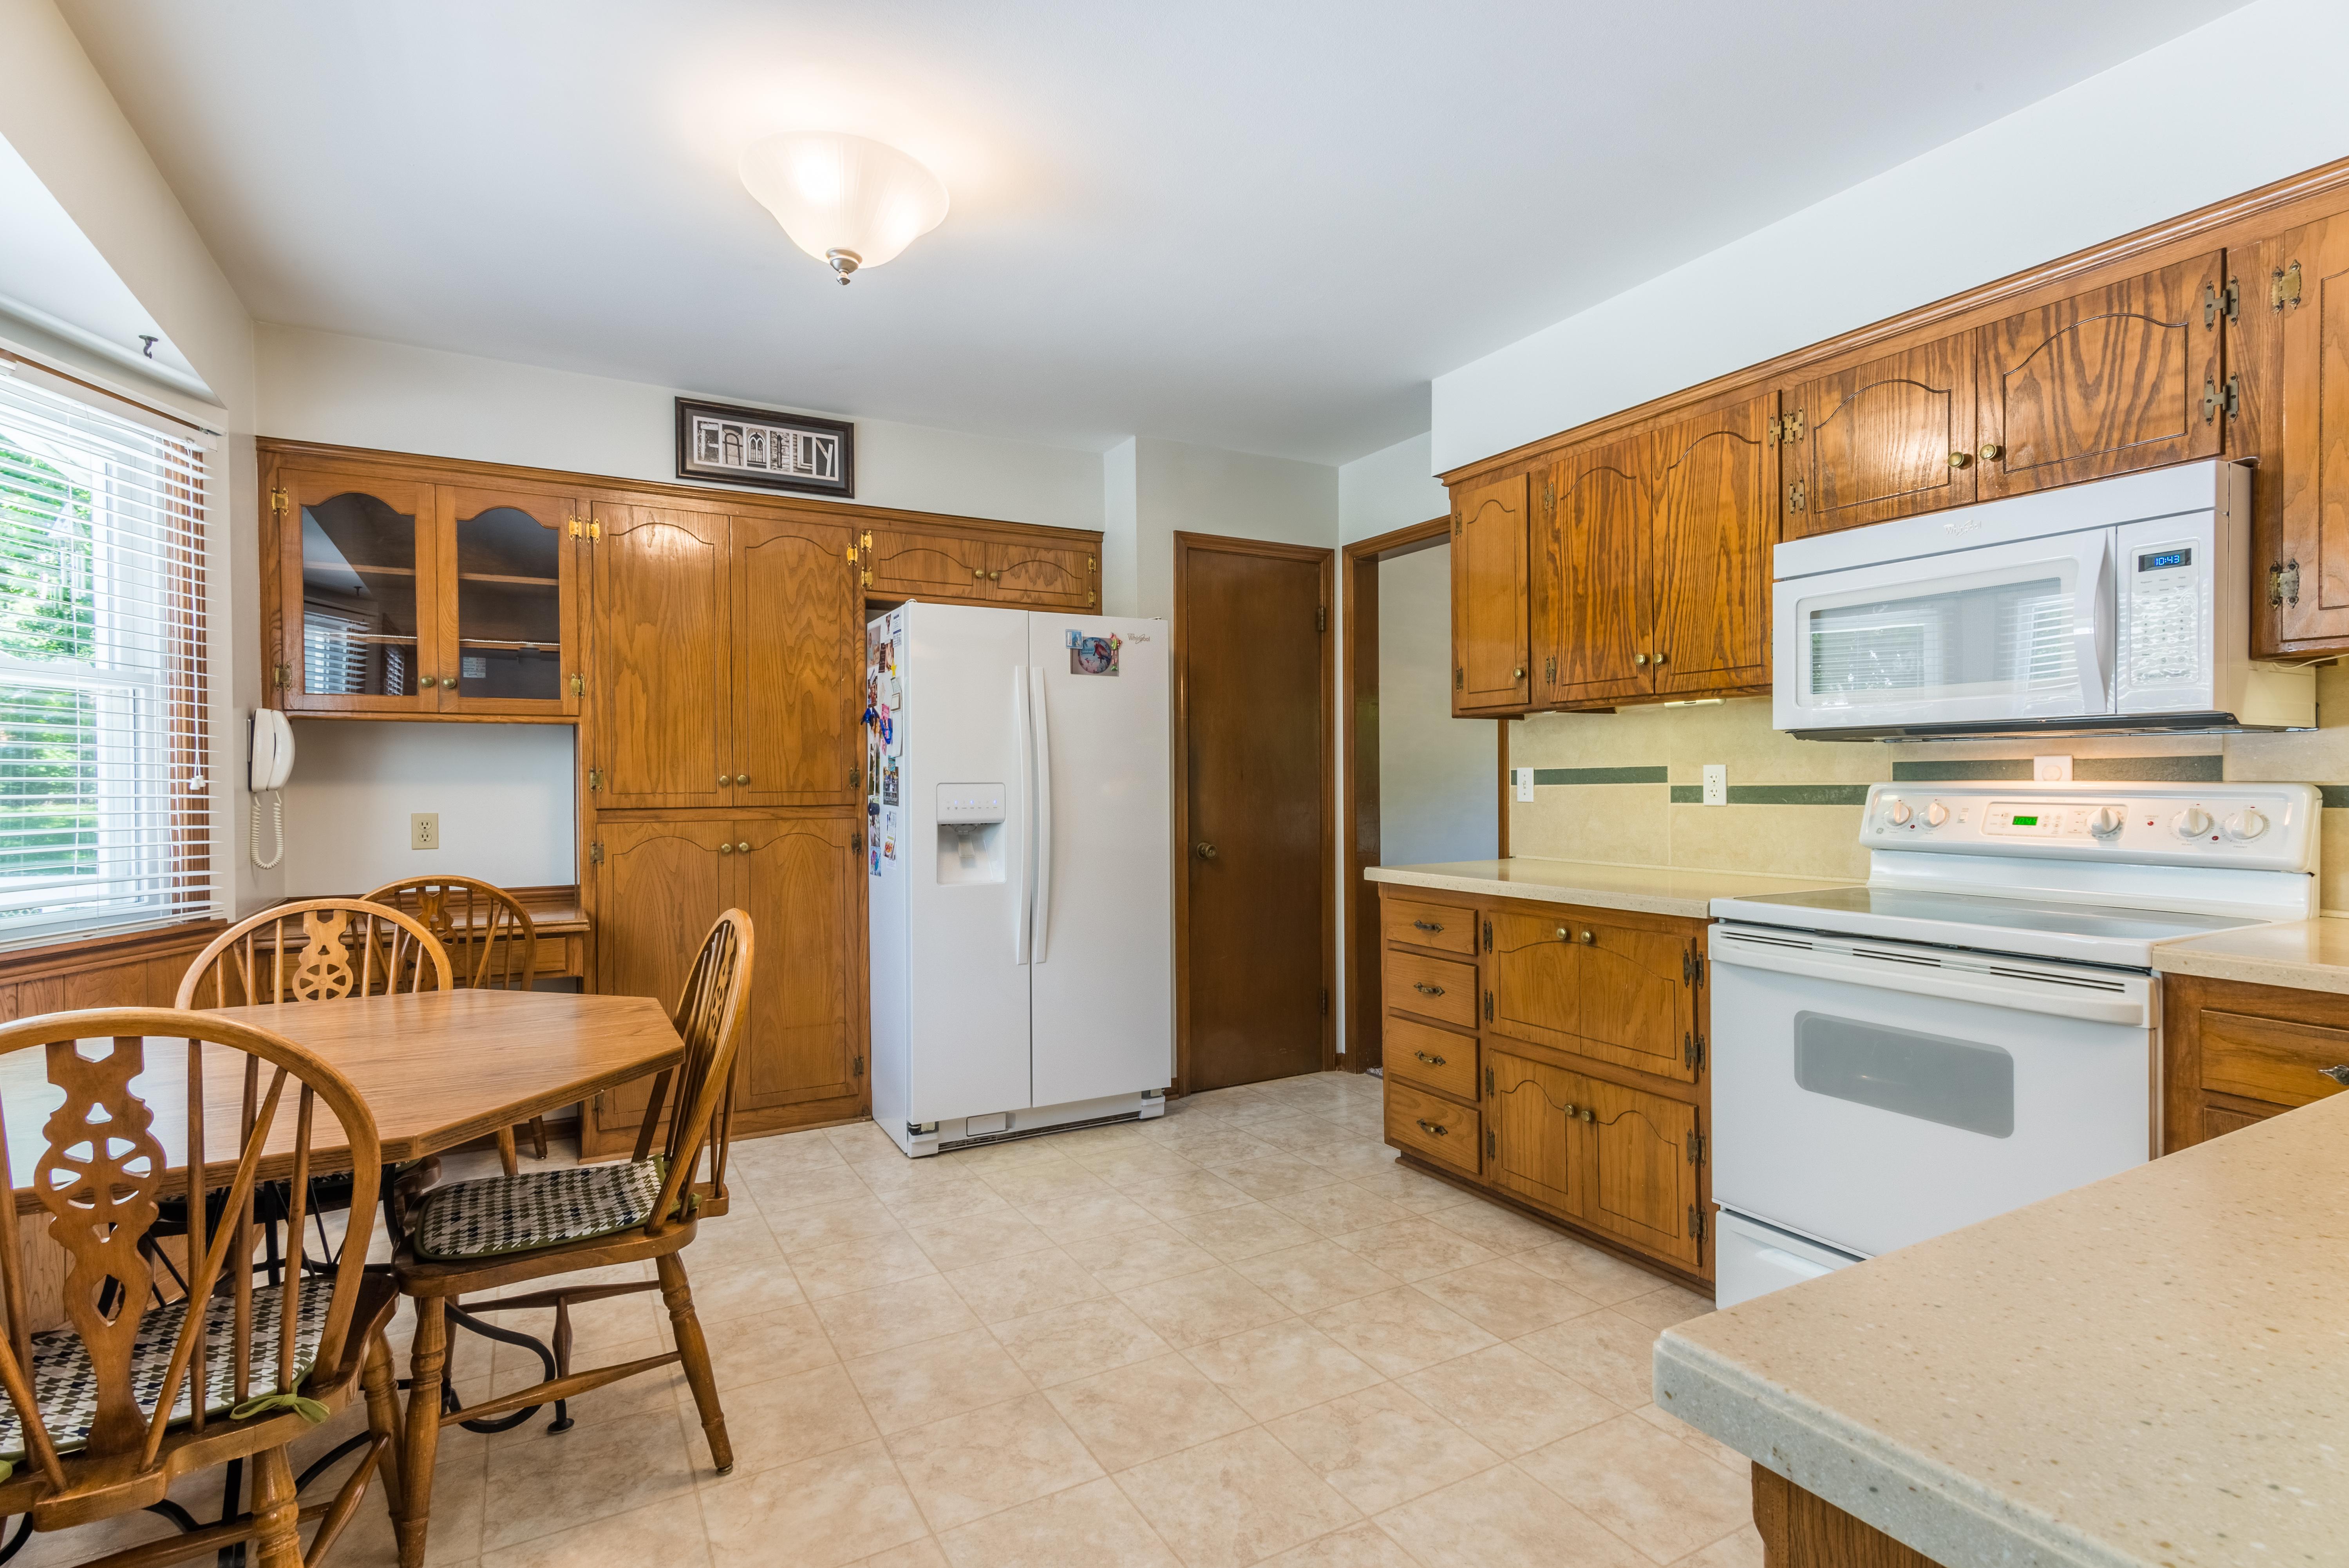 12109 W 60Th Terrace, Shawnee-28